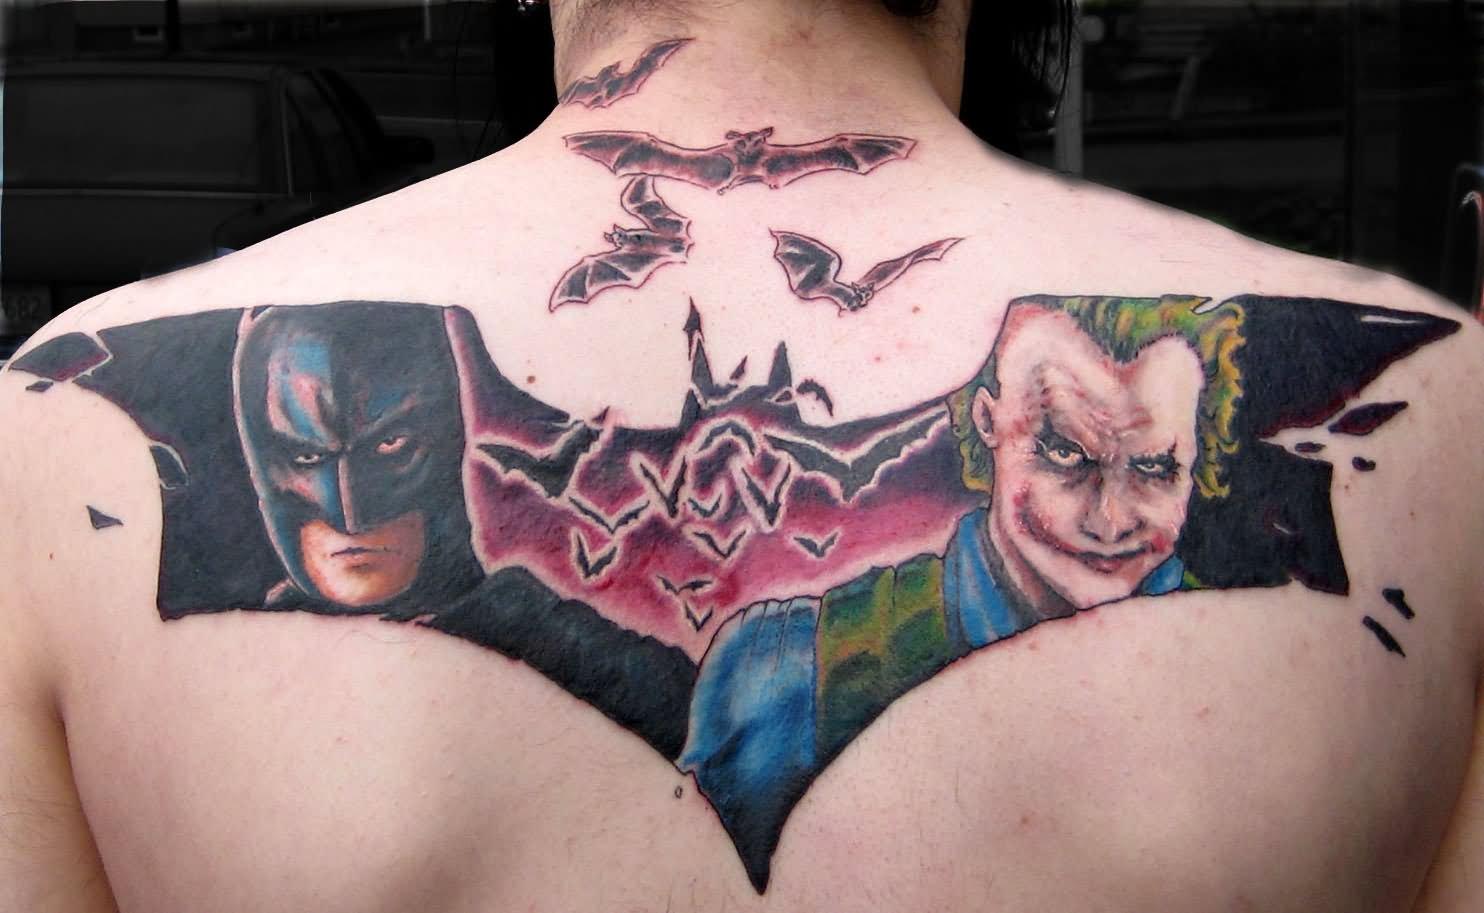 Tattoo designs on the back - Batman And Joker Face Tattoo On Upper Back